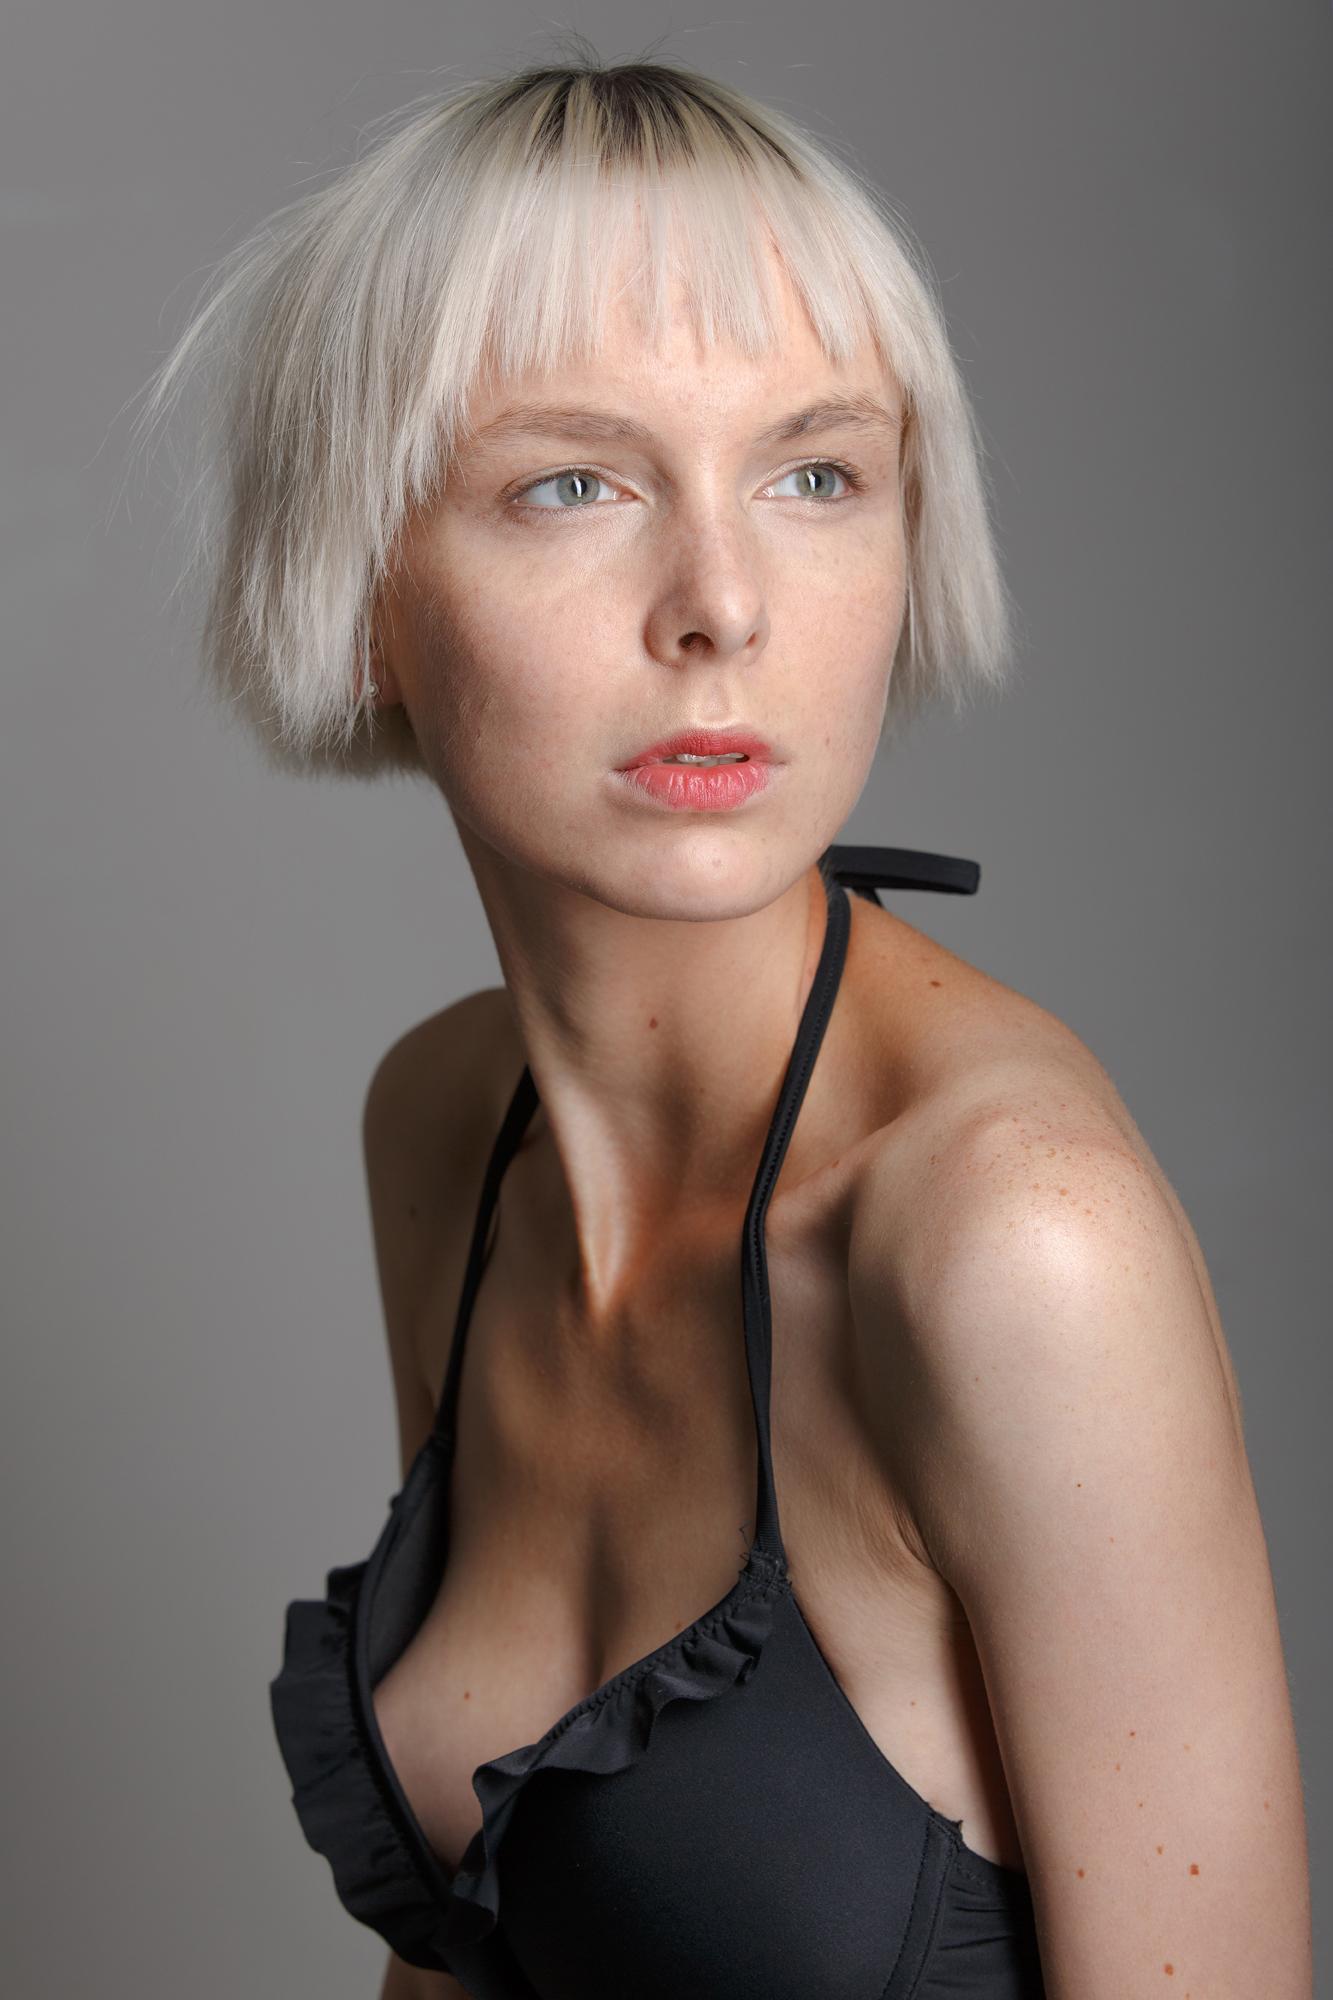 Female model with short white hair cosmetic studio portrait